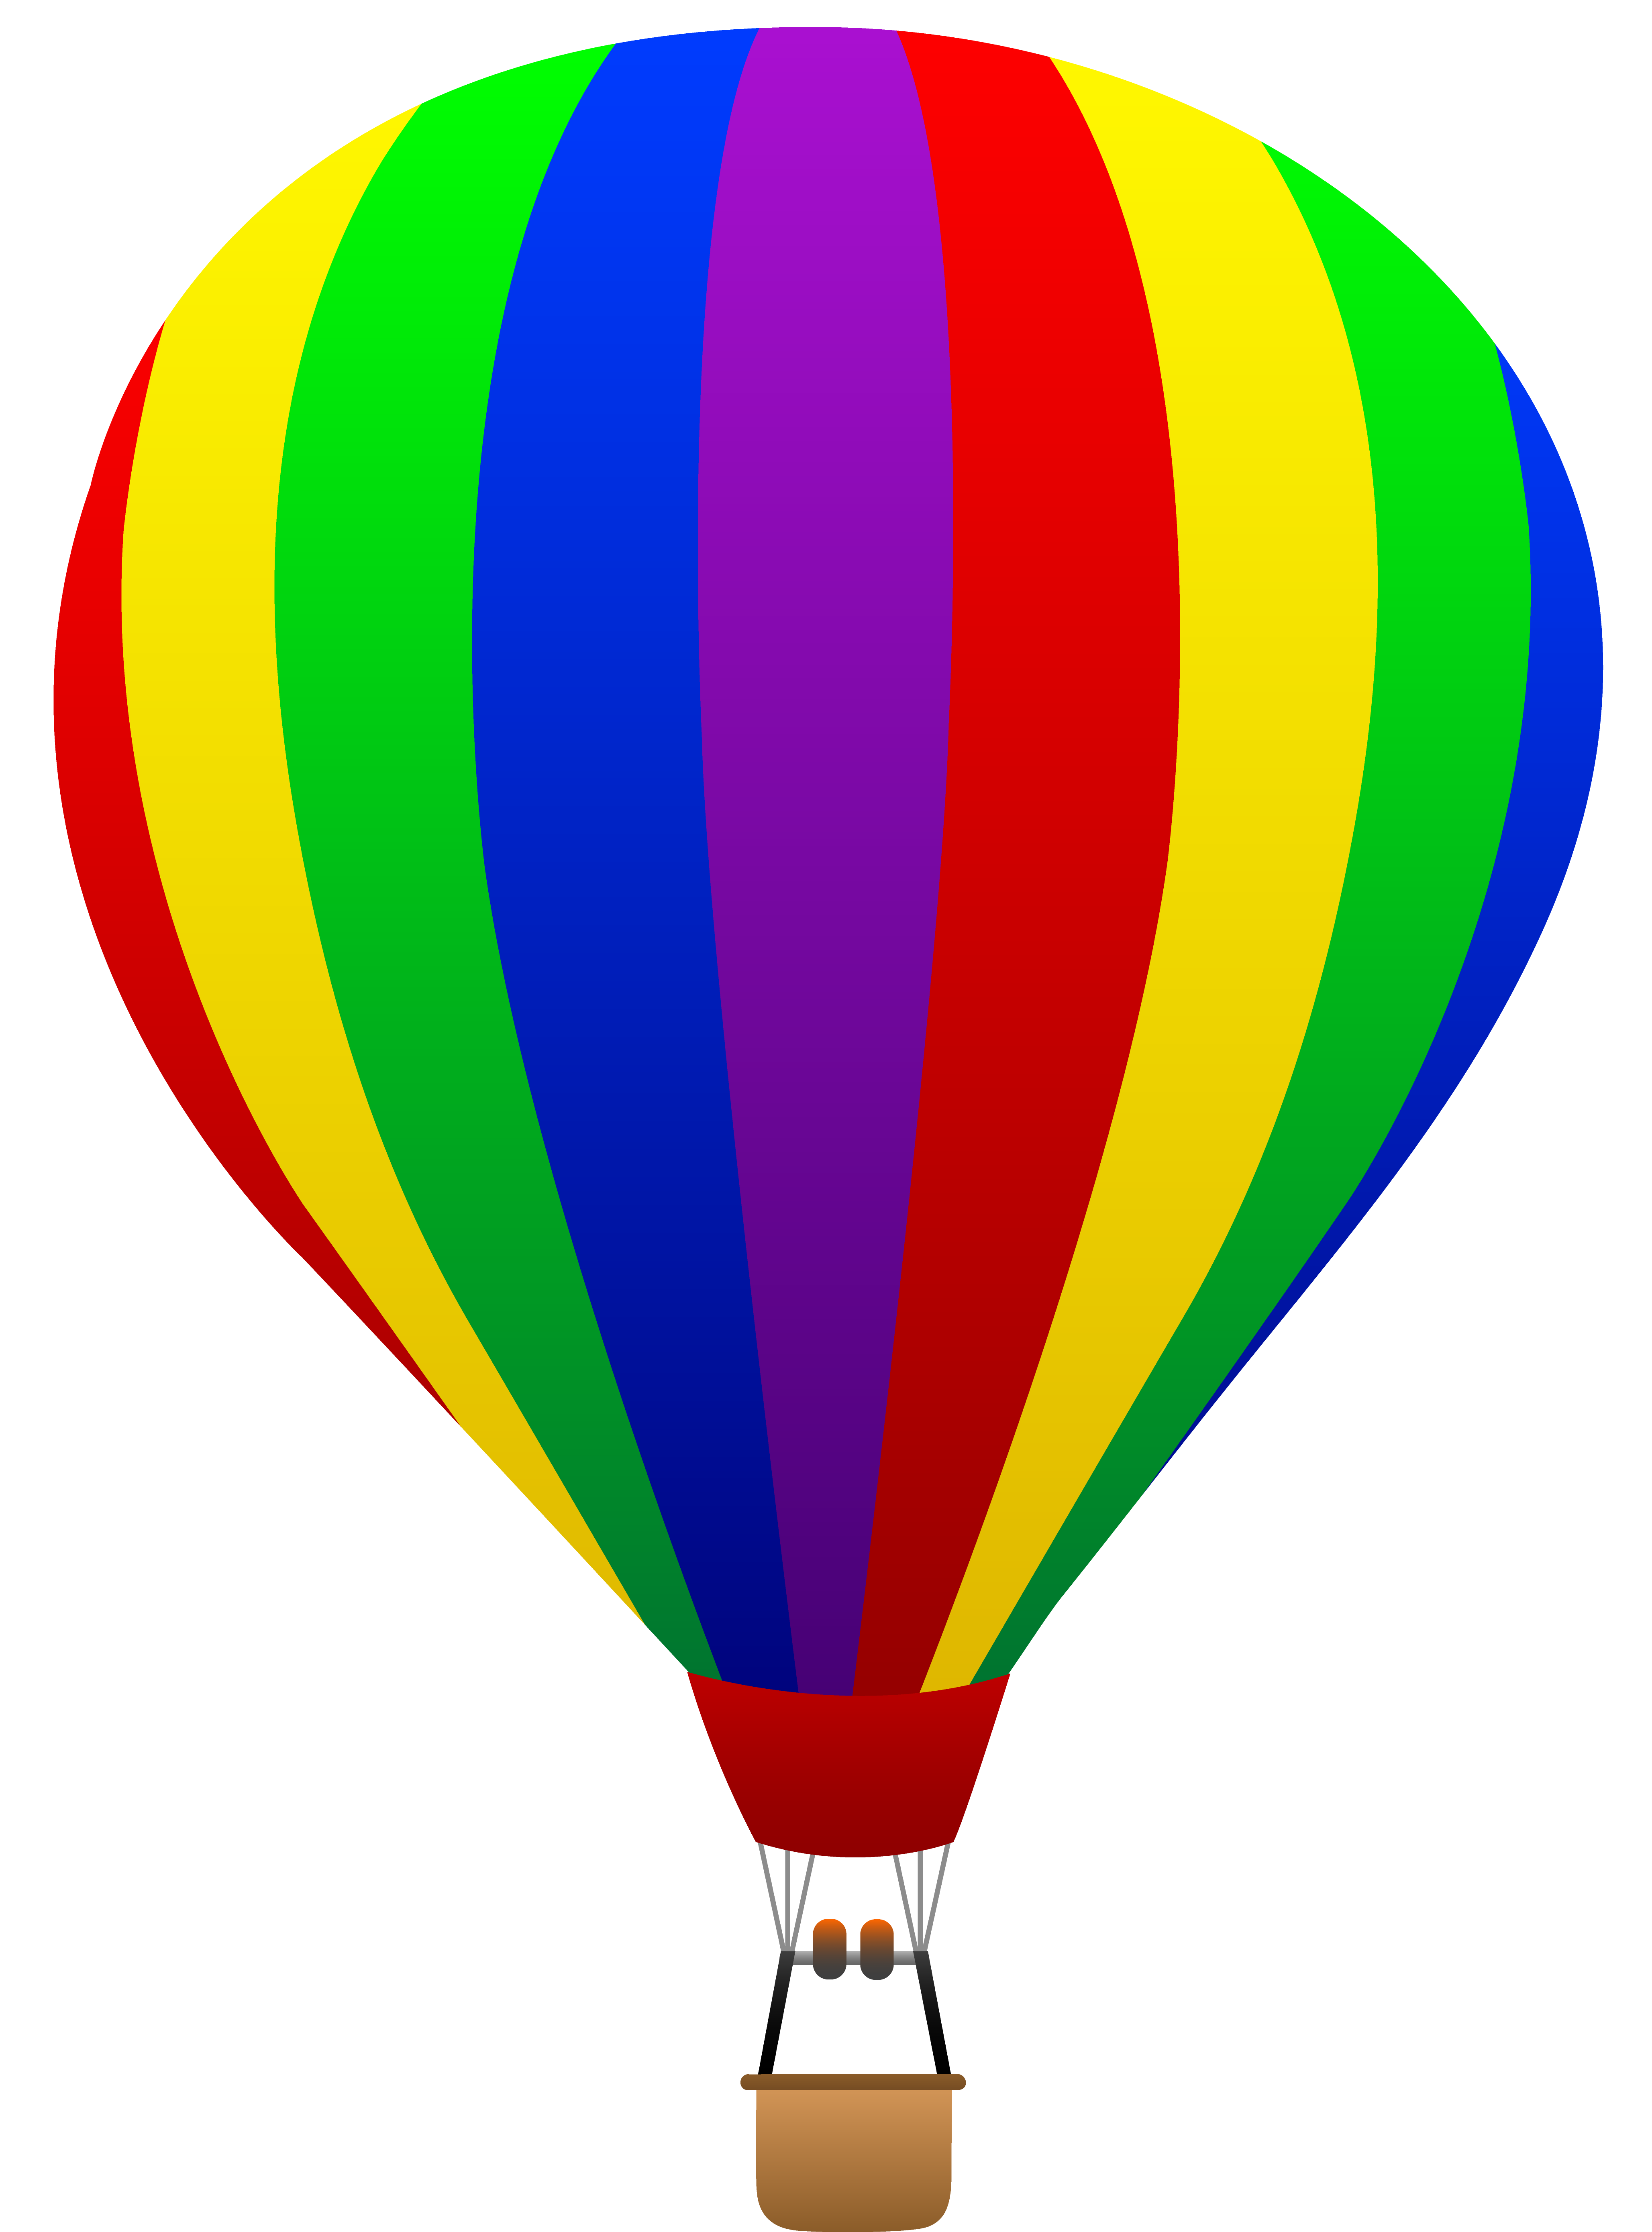 Hot Air Balloon Linen ... Welcome To-Hot Air Balloon Linen ... Welcome to-17